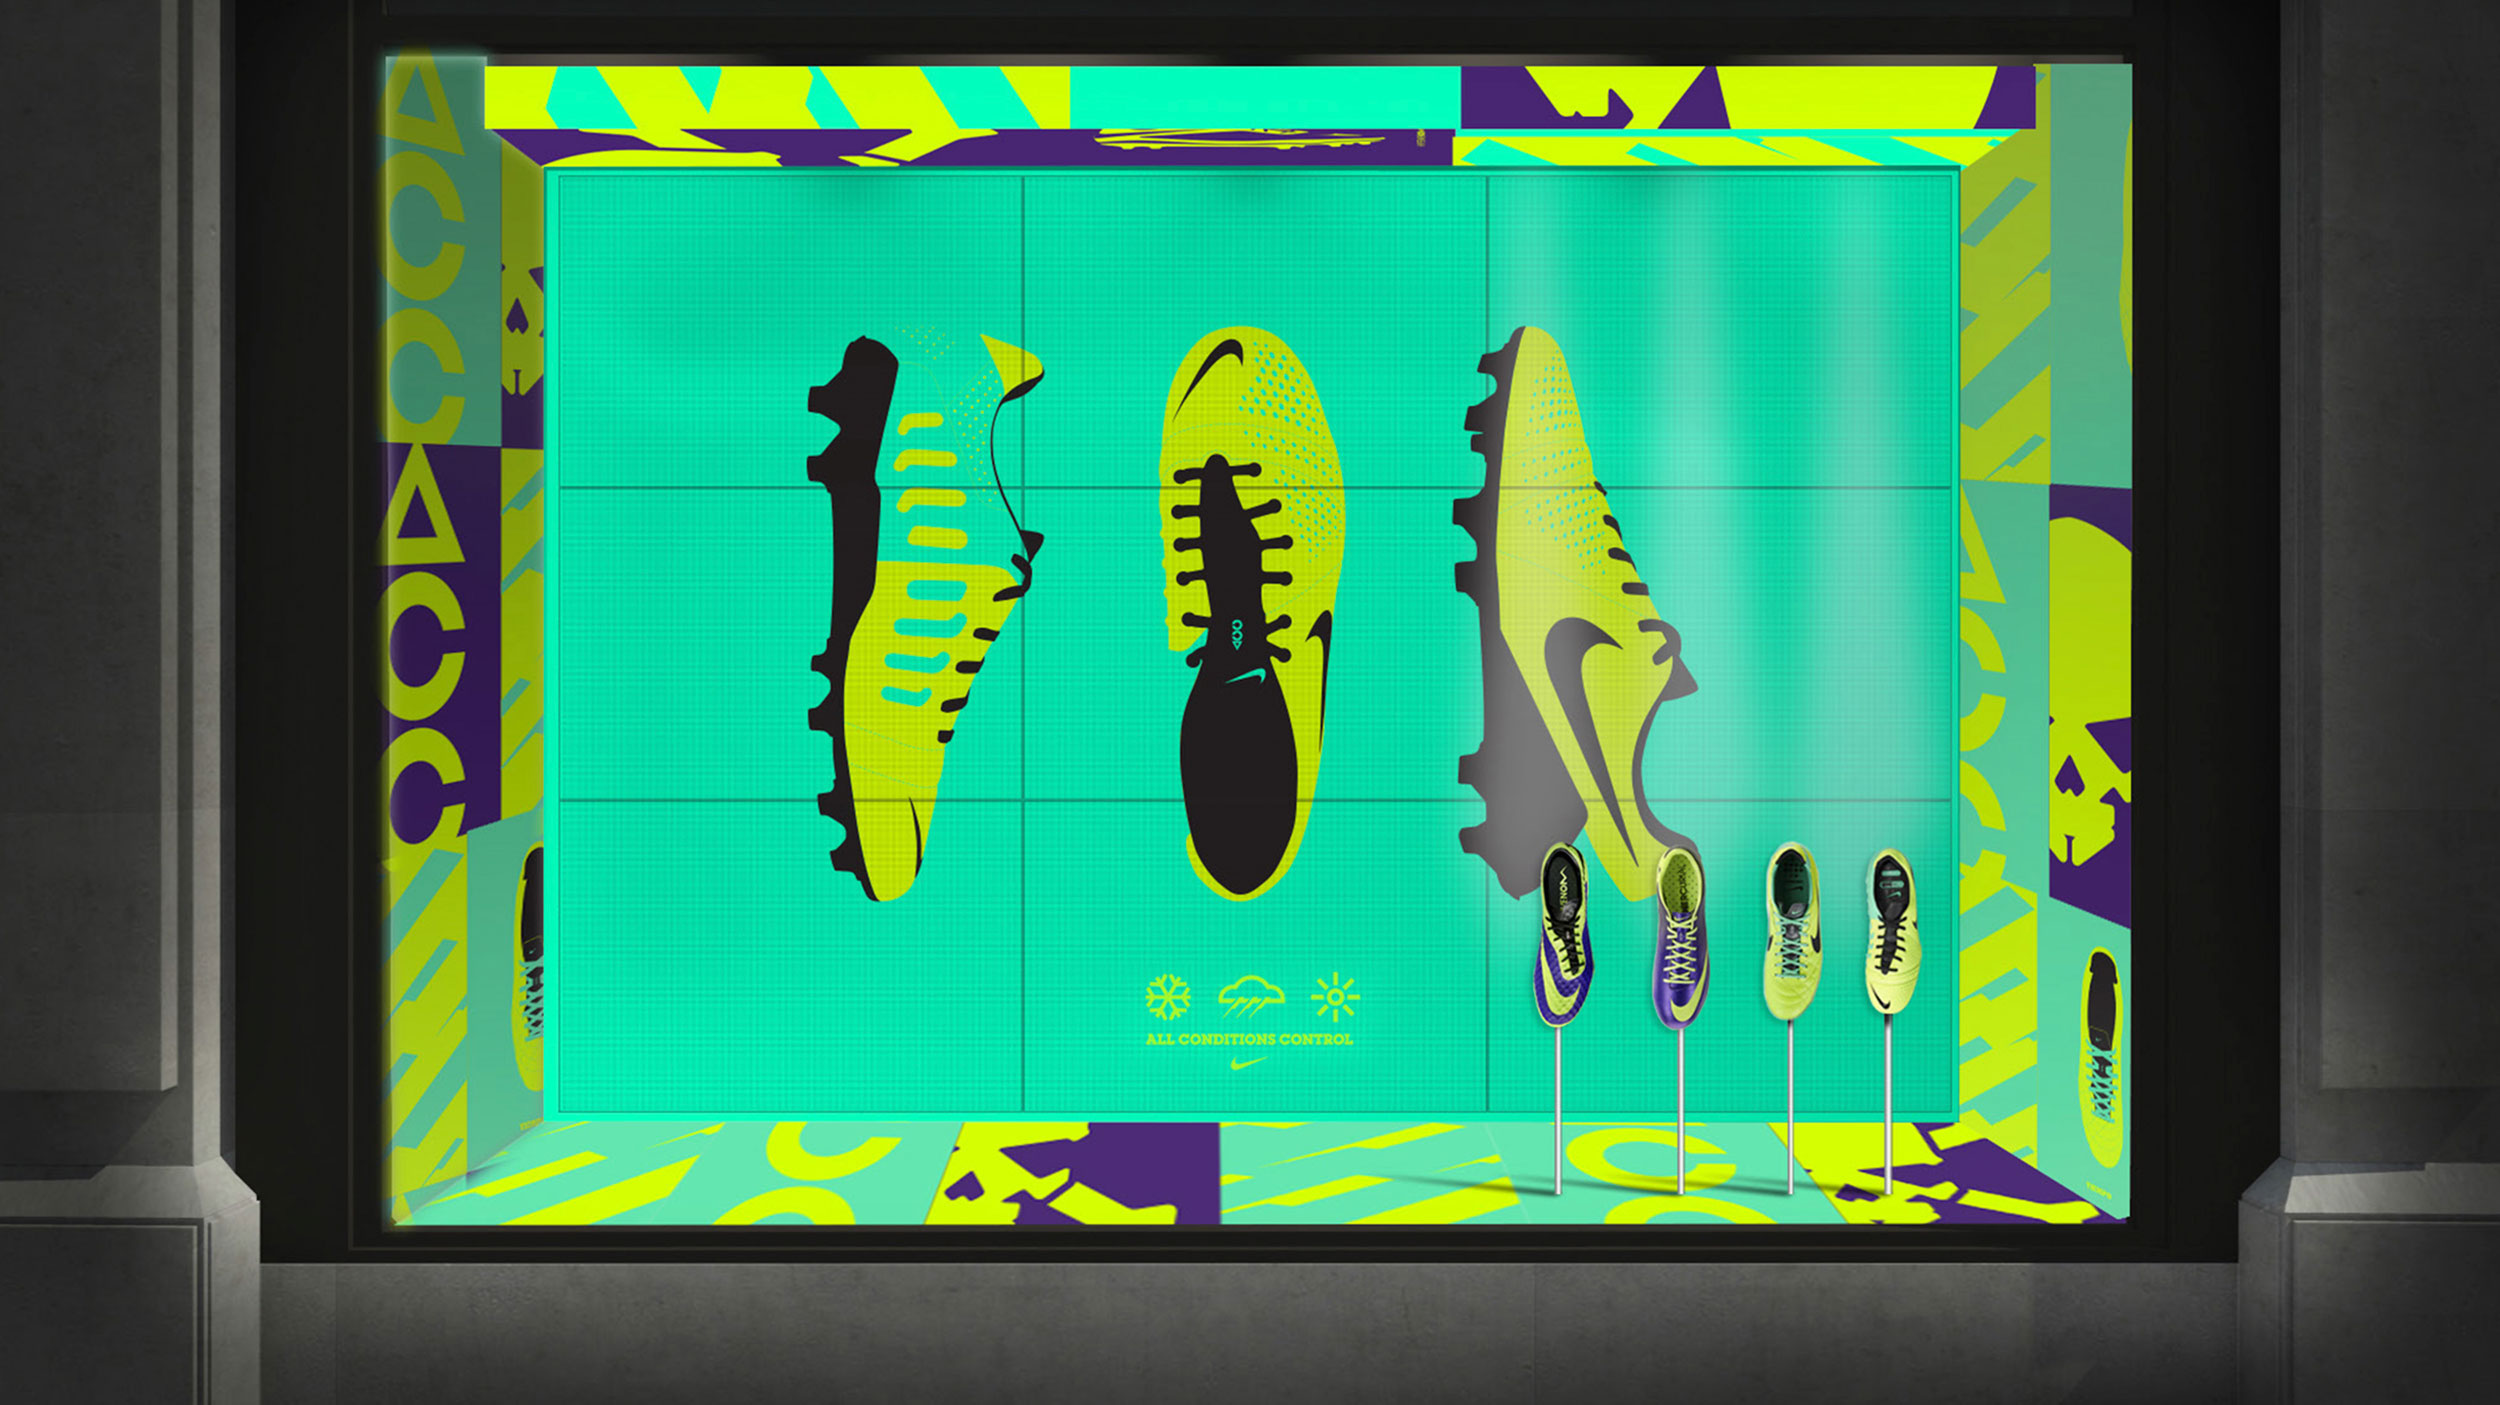 AntonioBrasko-Nike-StandOut-HiVis-Futbol-RetailDesign-04.jpg